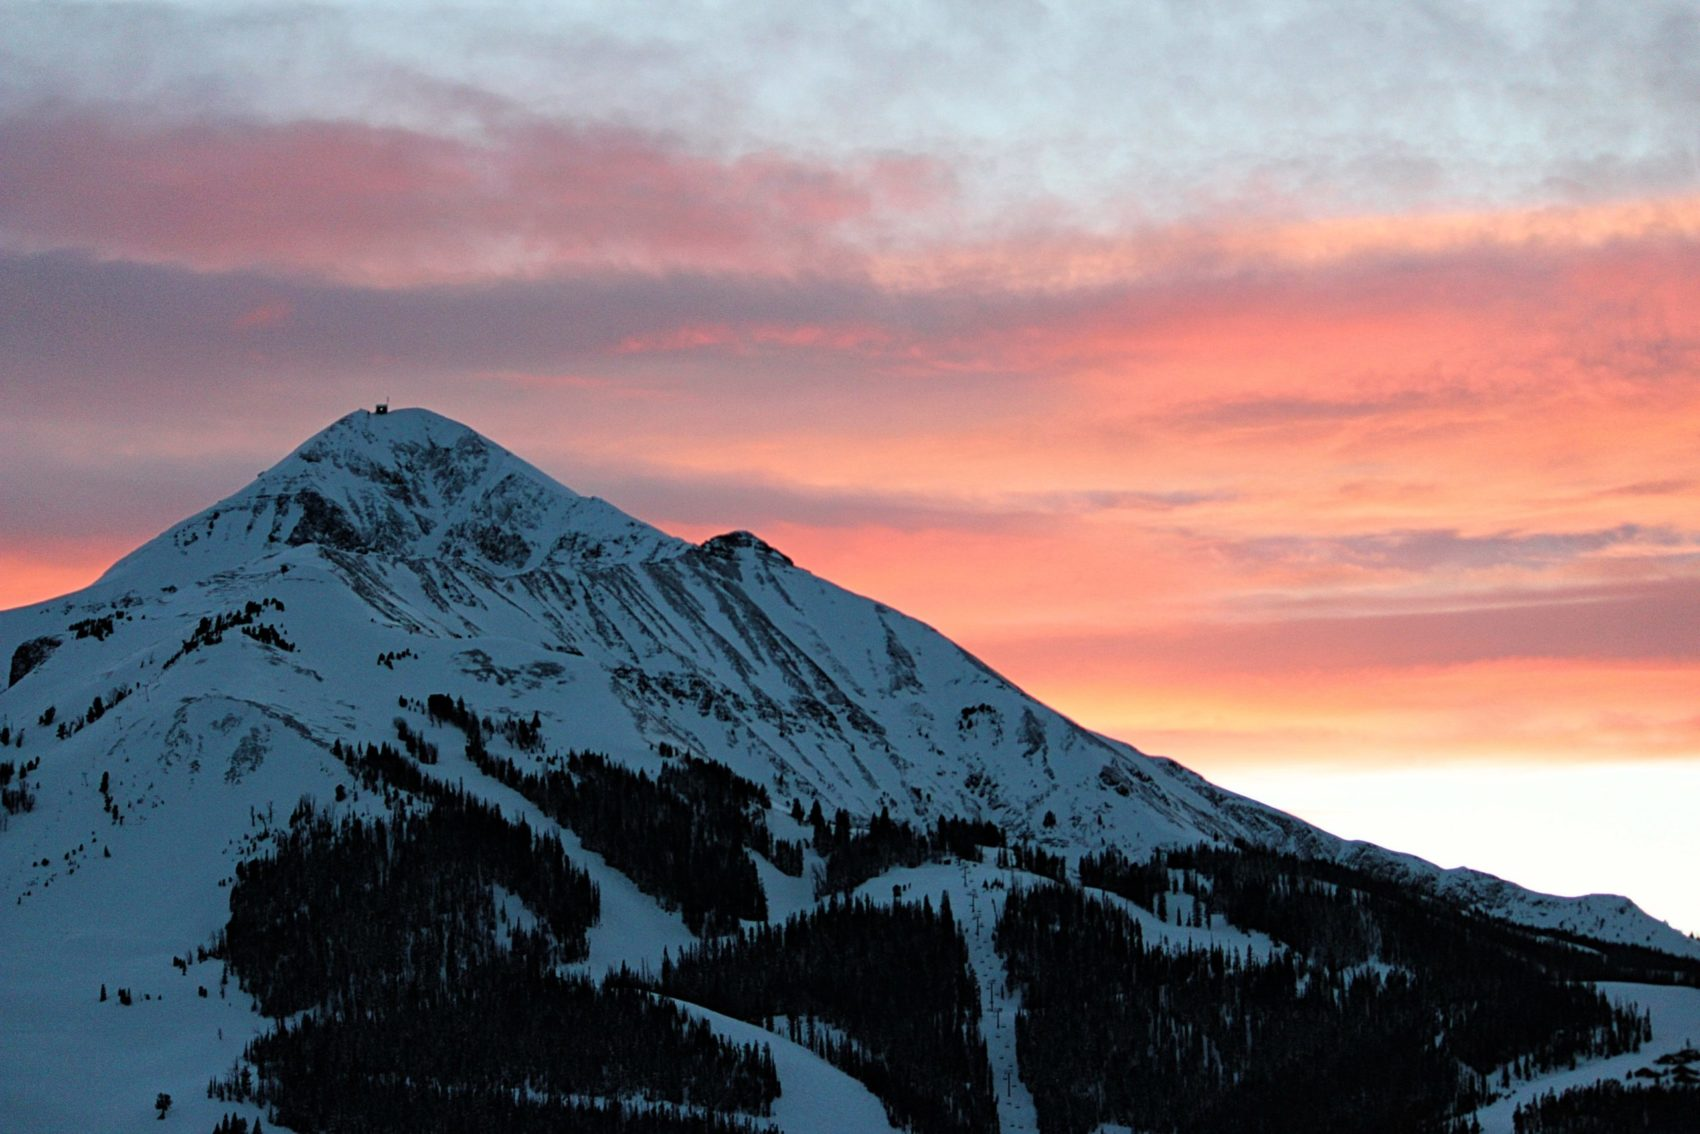 Lone Peak at sunset